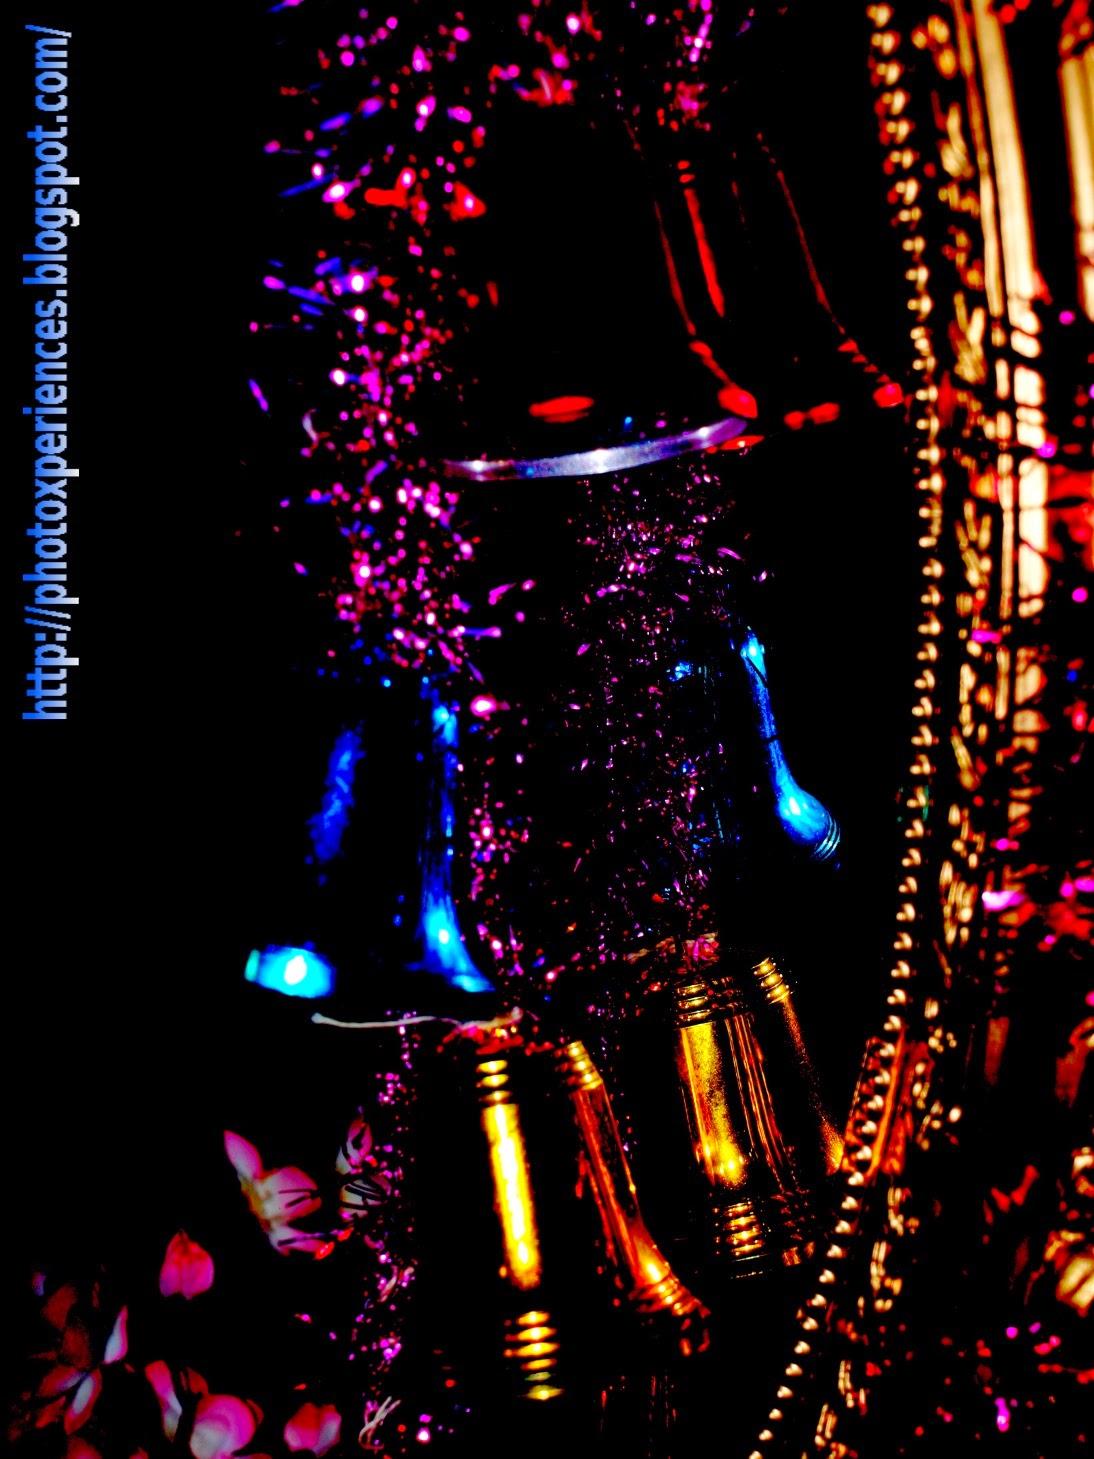 Christmas bells detail - Detalle navideño con campanas